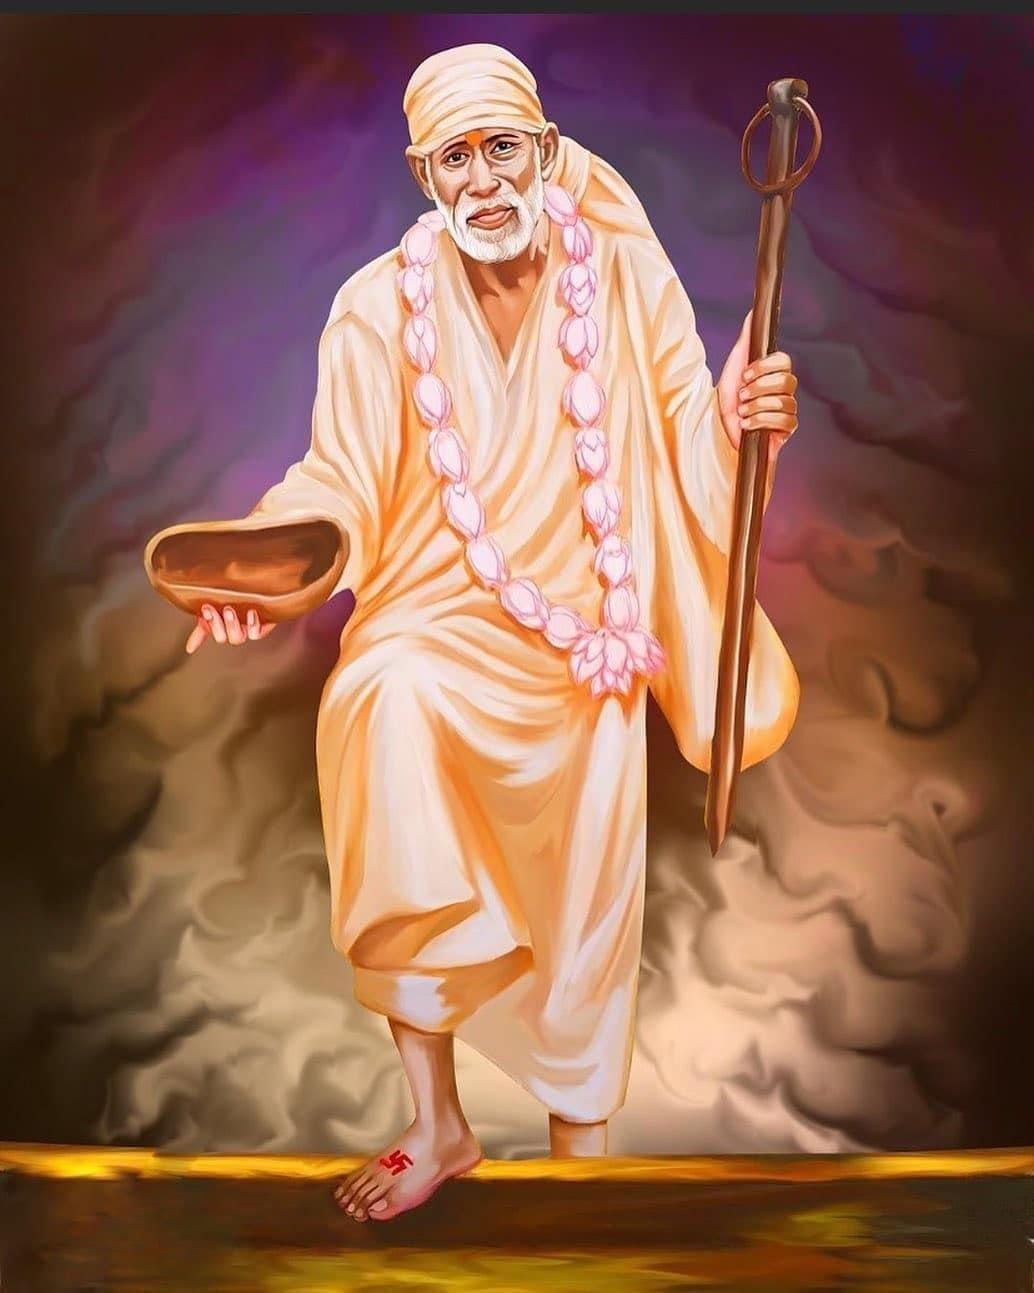 50 Sai Baba Images In Hd Vedic Sources Shirdi Sai Baba Wallpapers Baba Image Sai Baba Wallpapers